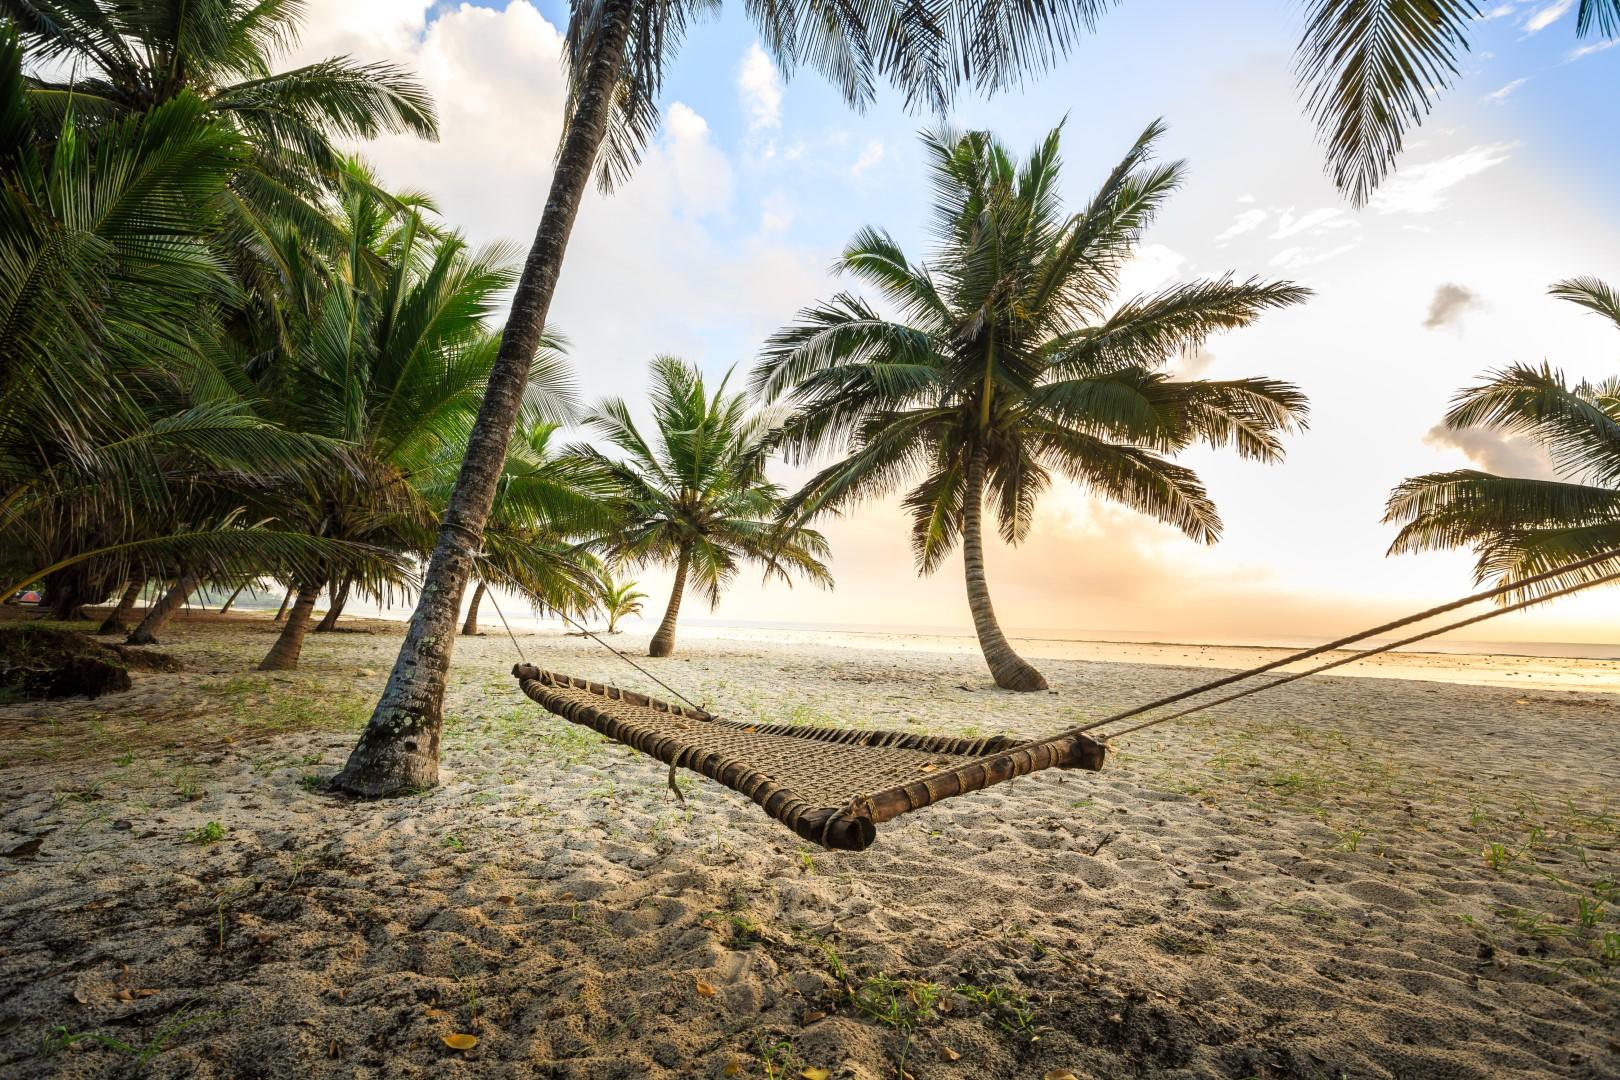 Safari okruh Keňou s pobytem u moře #3